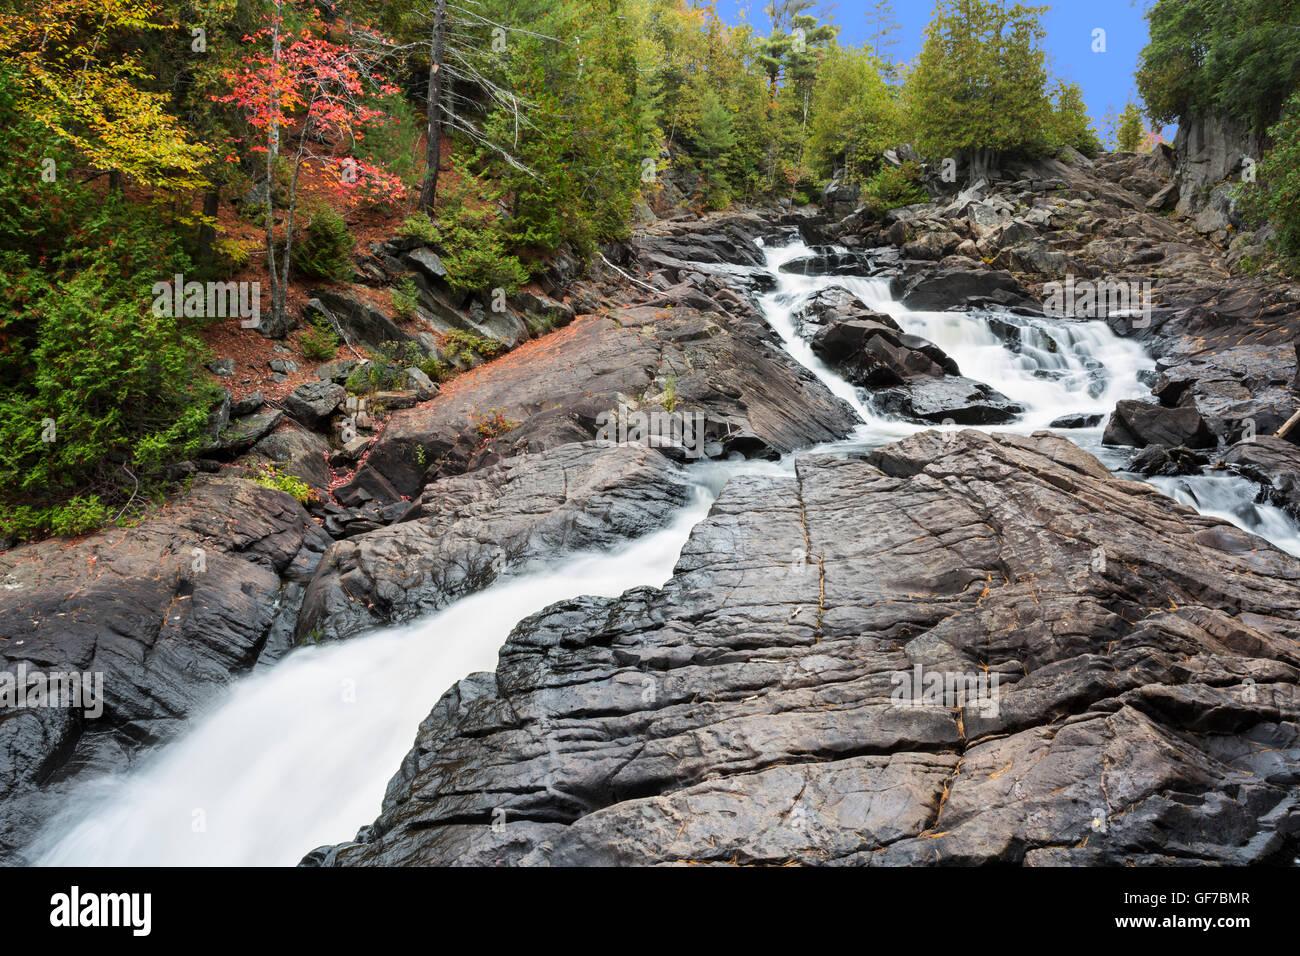 North America, Canada, Ontario, Ragged Falls Provincial Park, Ragged Falls, Oxtongue River - Stock Image